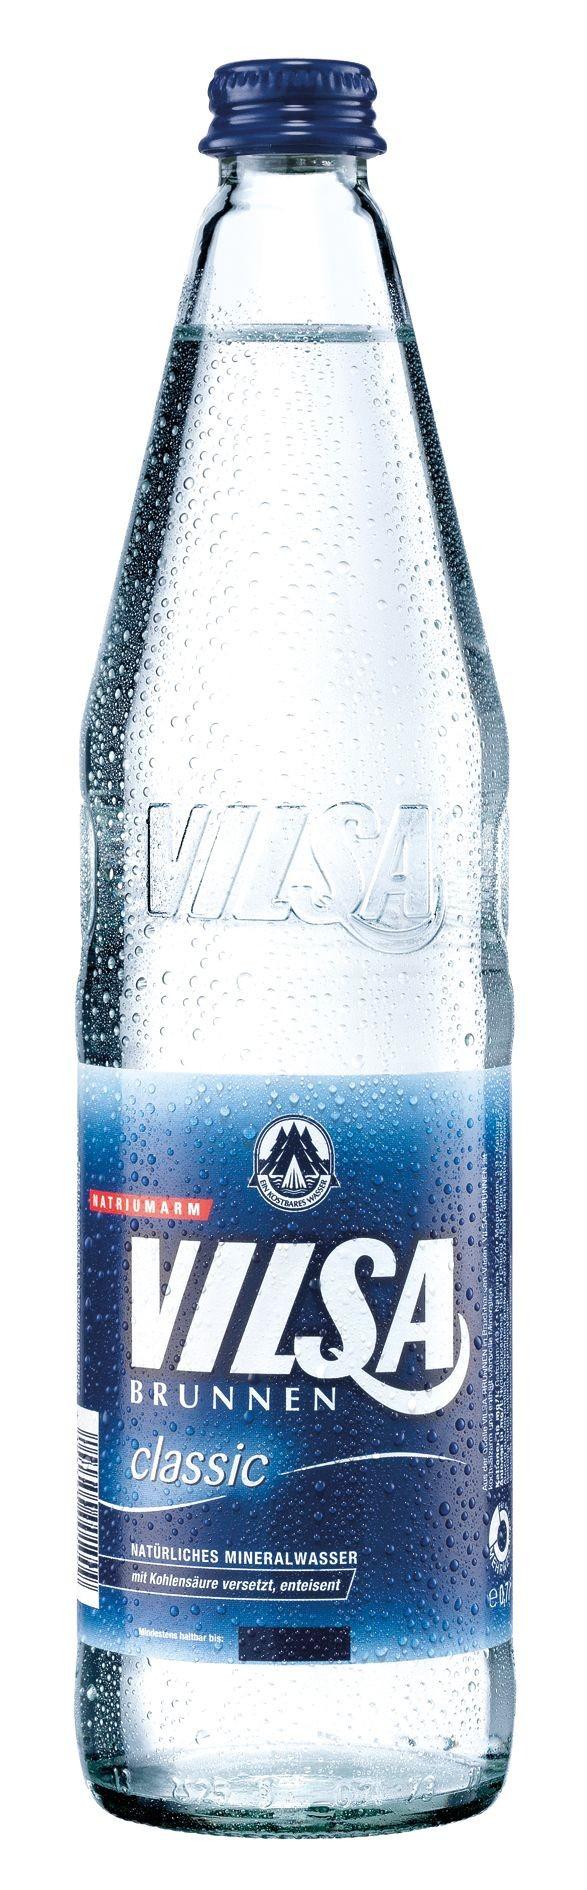 Vilsa Classic 12x0,7 Glasflasche